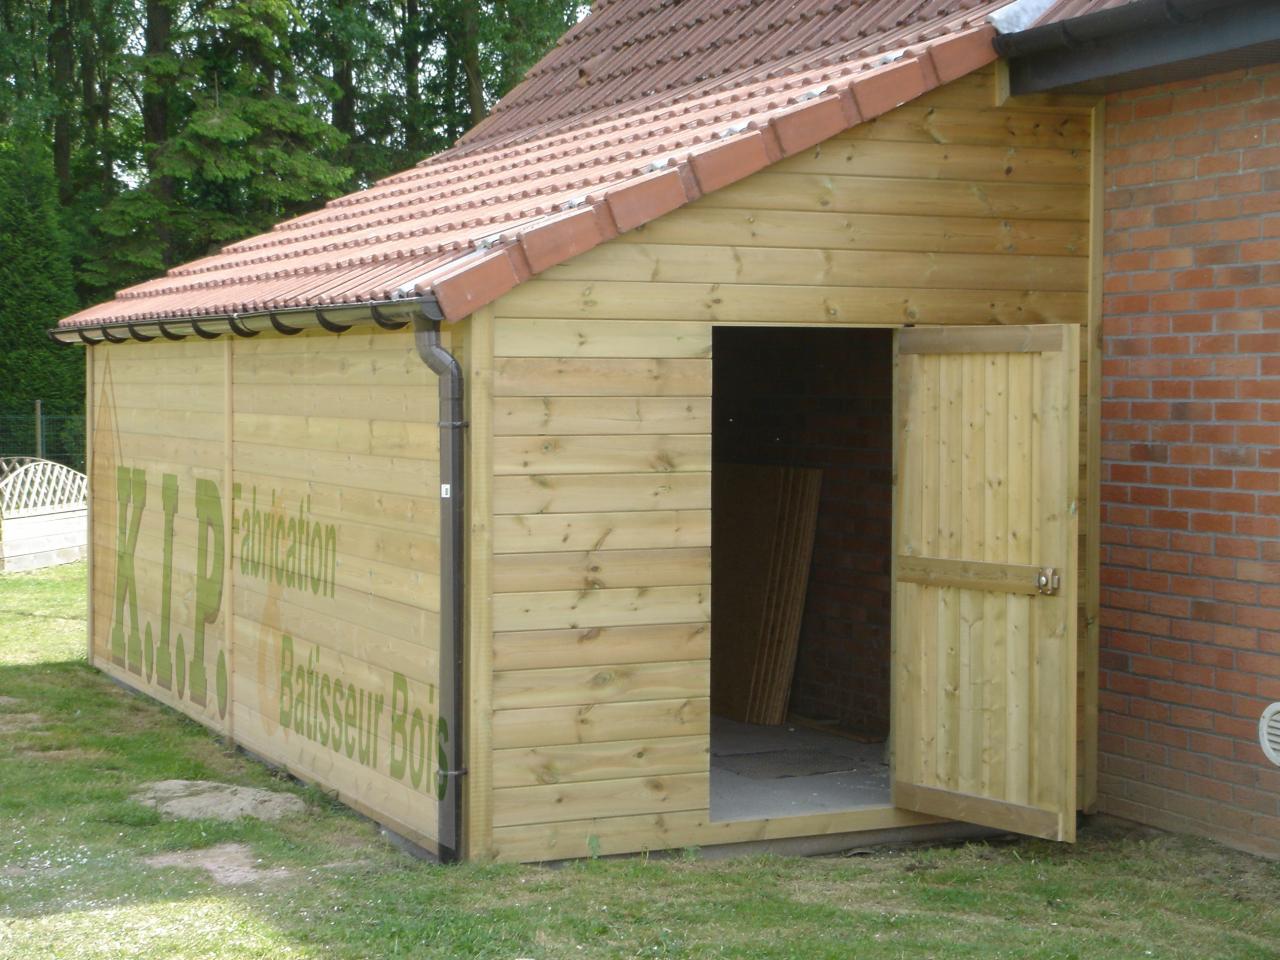 Cabane En Bois Garage - Mailleraye.fr Jardin tout Abri De Jardin 1 Pente 12M2